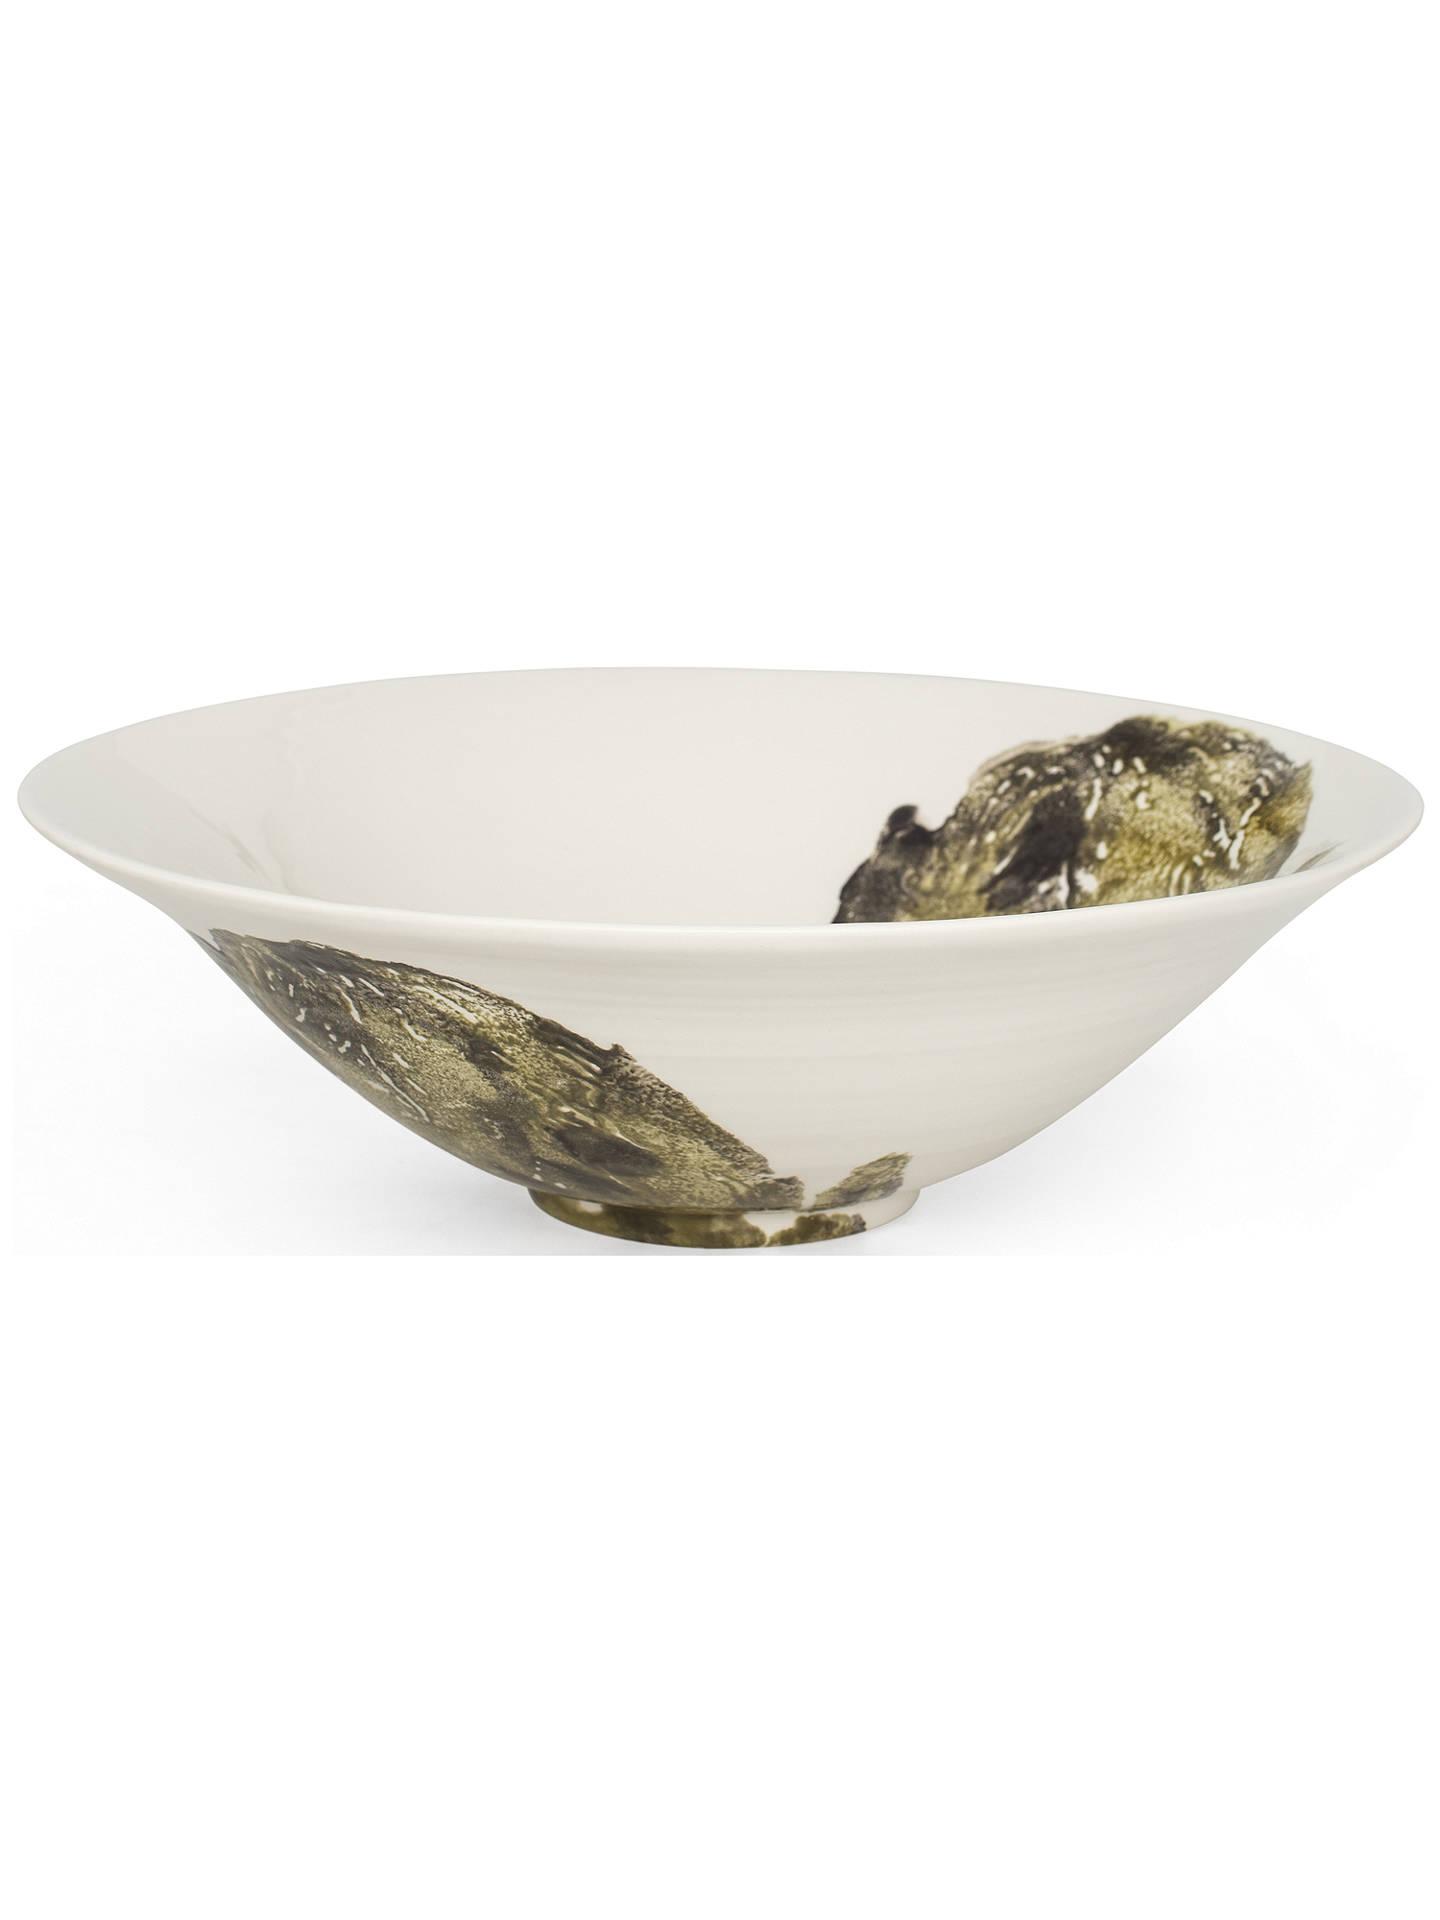 2c25b3377843 BuyEmily Bond Artichoke Salad Bowl